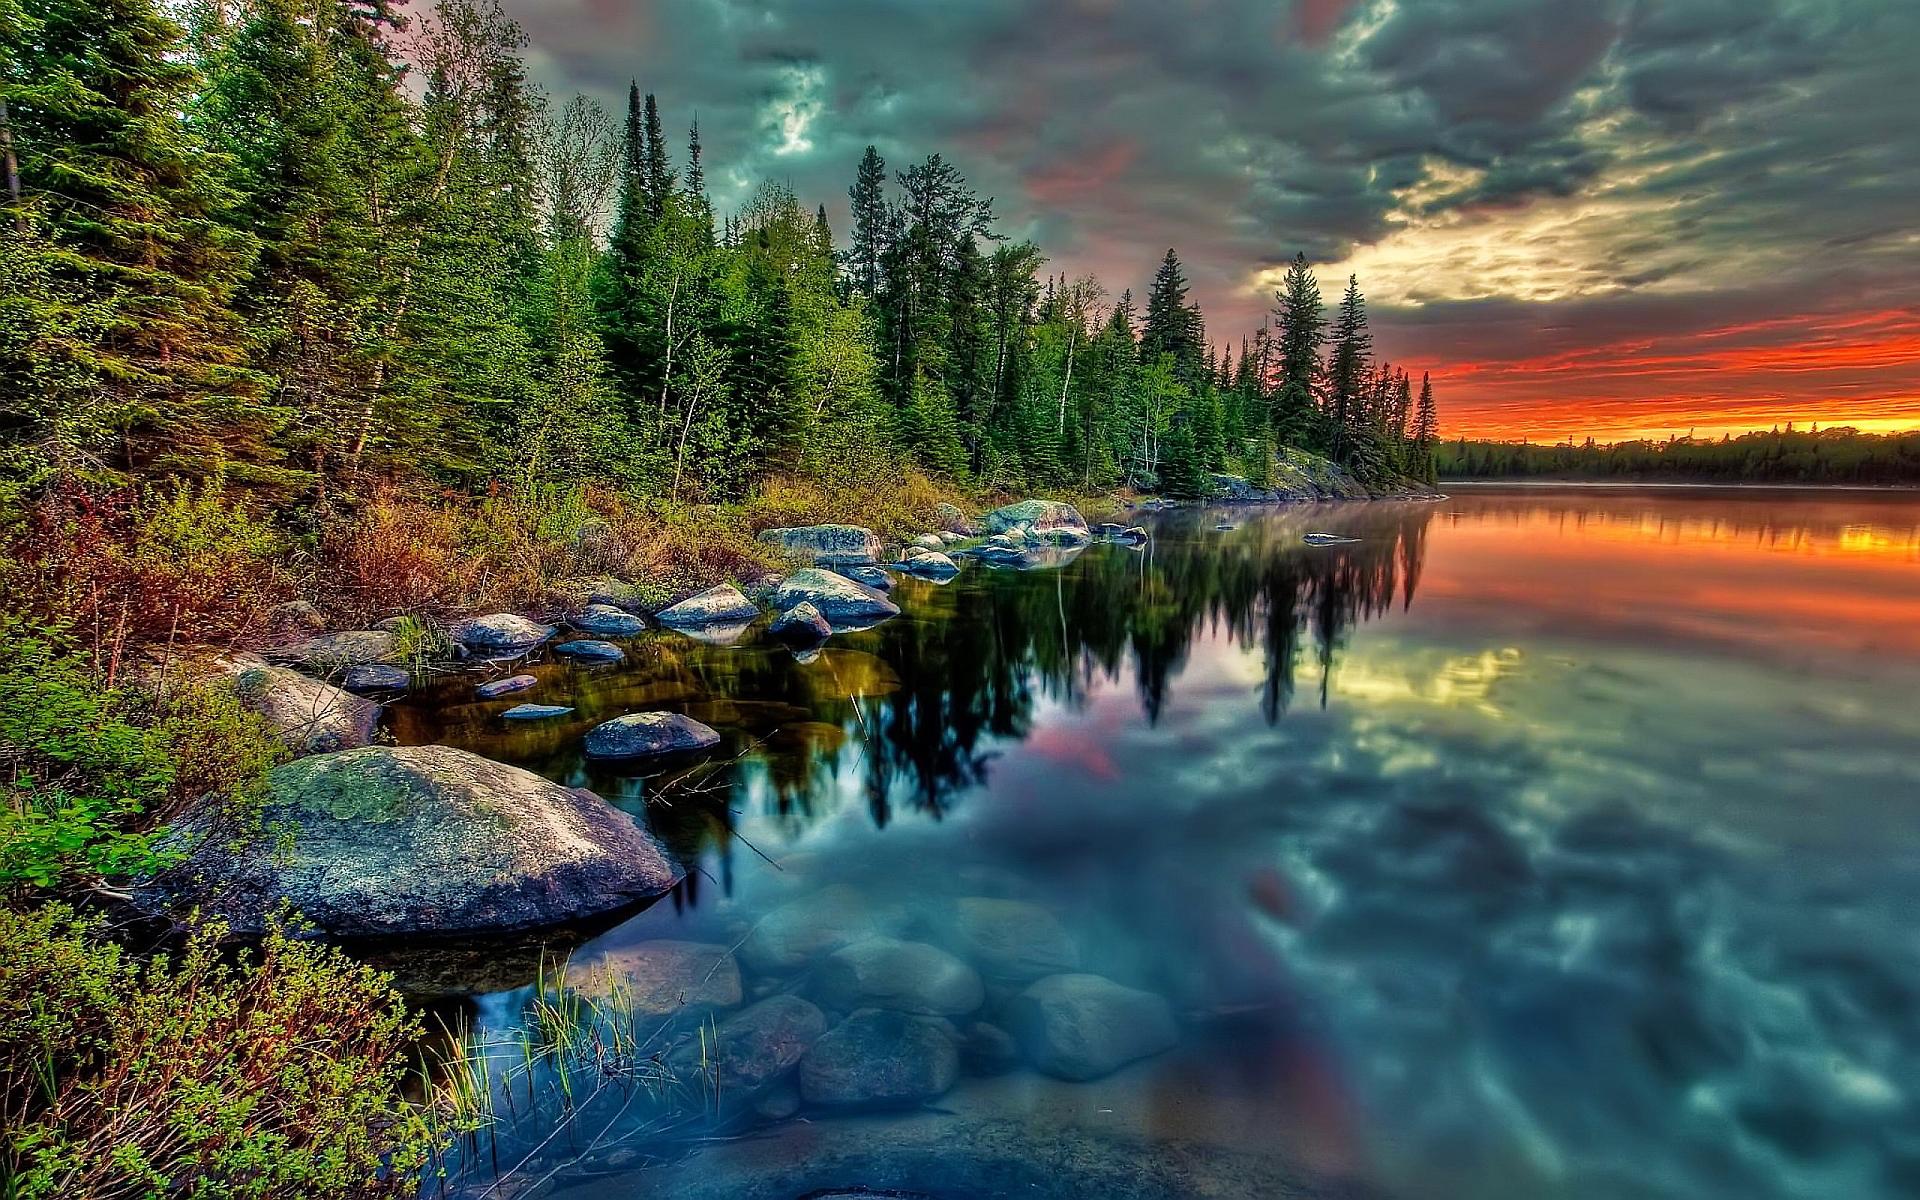 forest background images   hd desktop wallpapers 4k hd